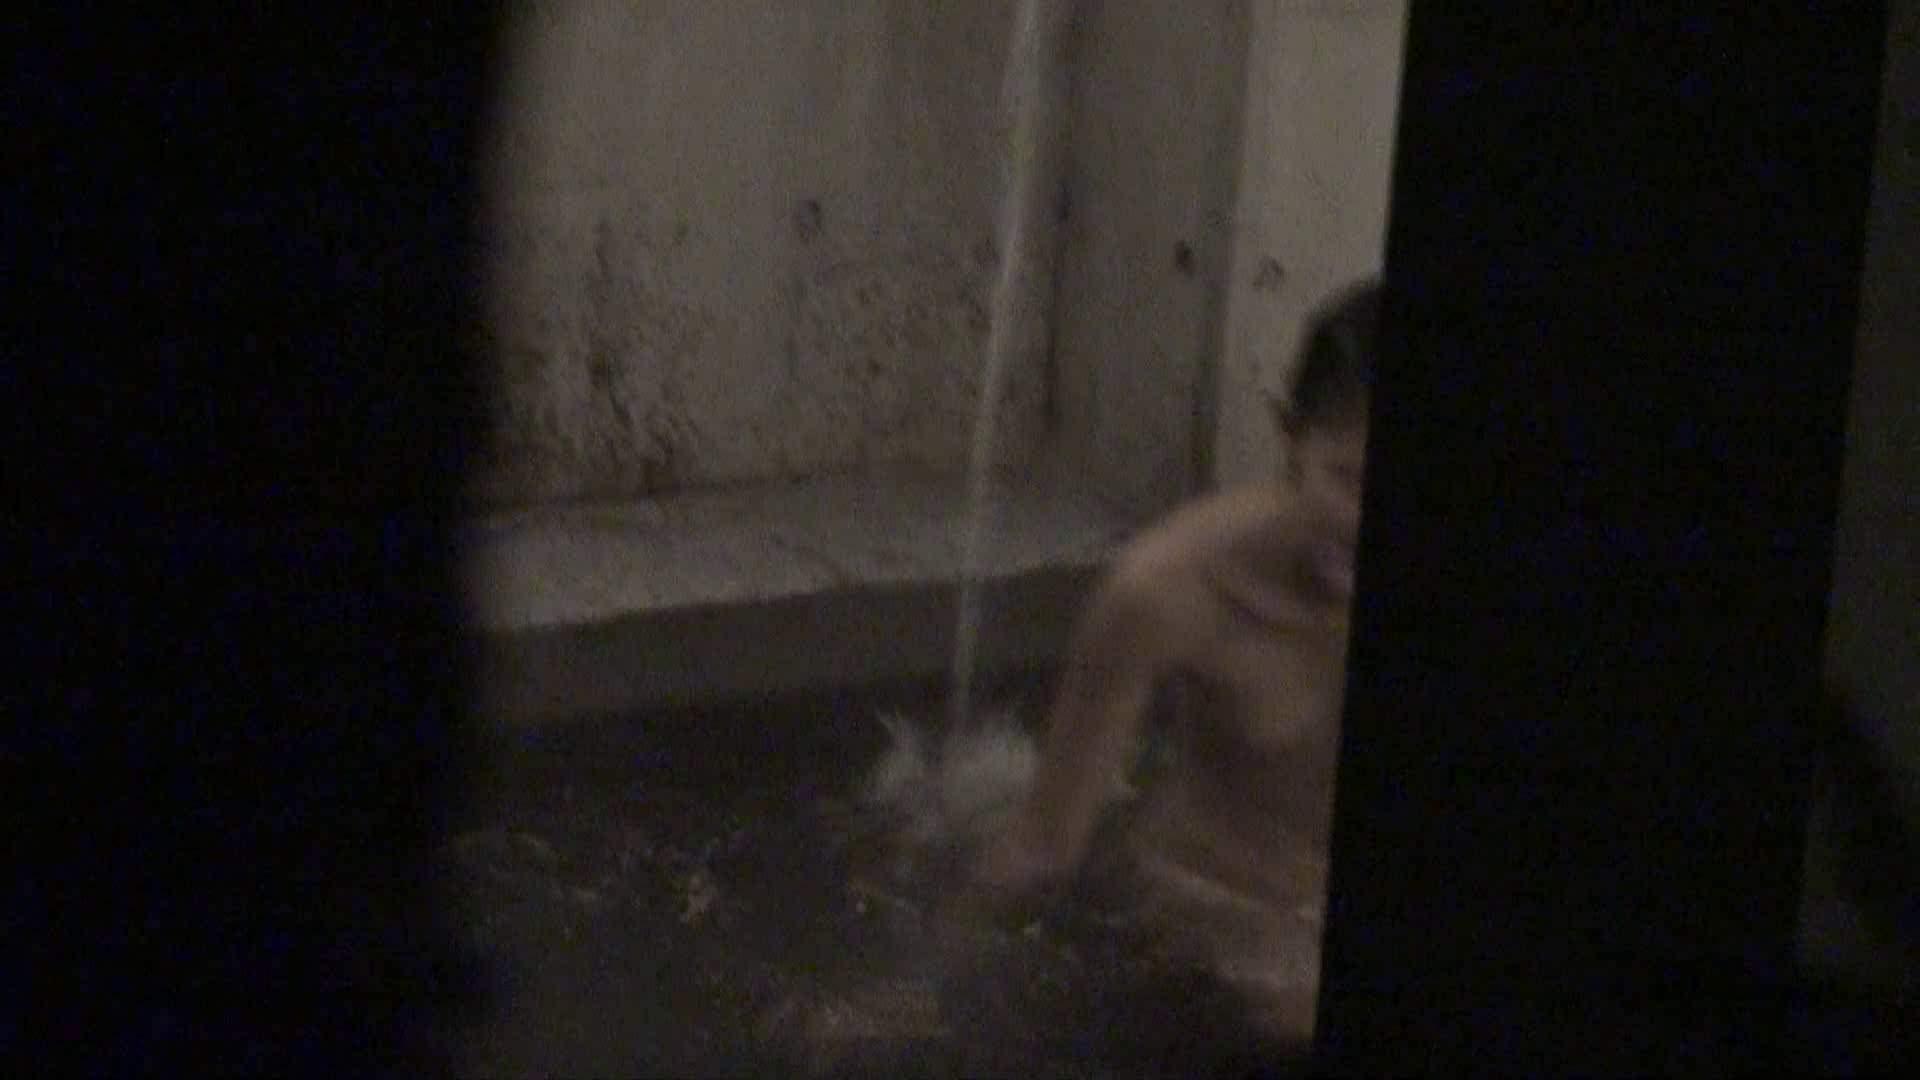 Aquaな露天風呂Vol.349 盗撮特撮 すけべAV動画紹介 10pic 2